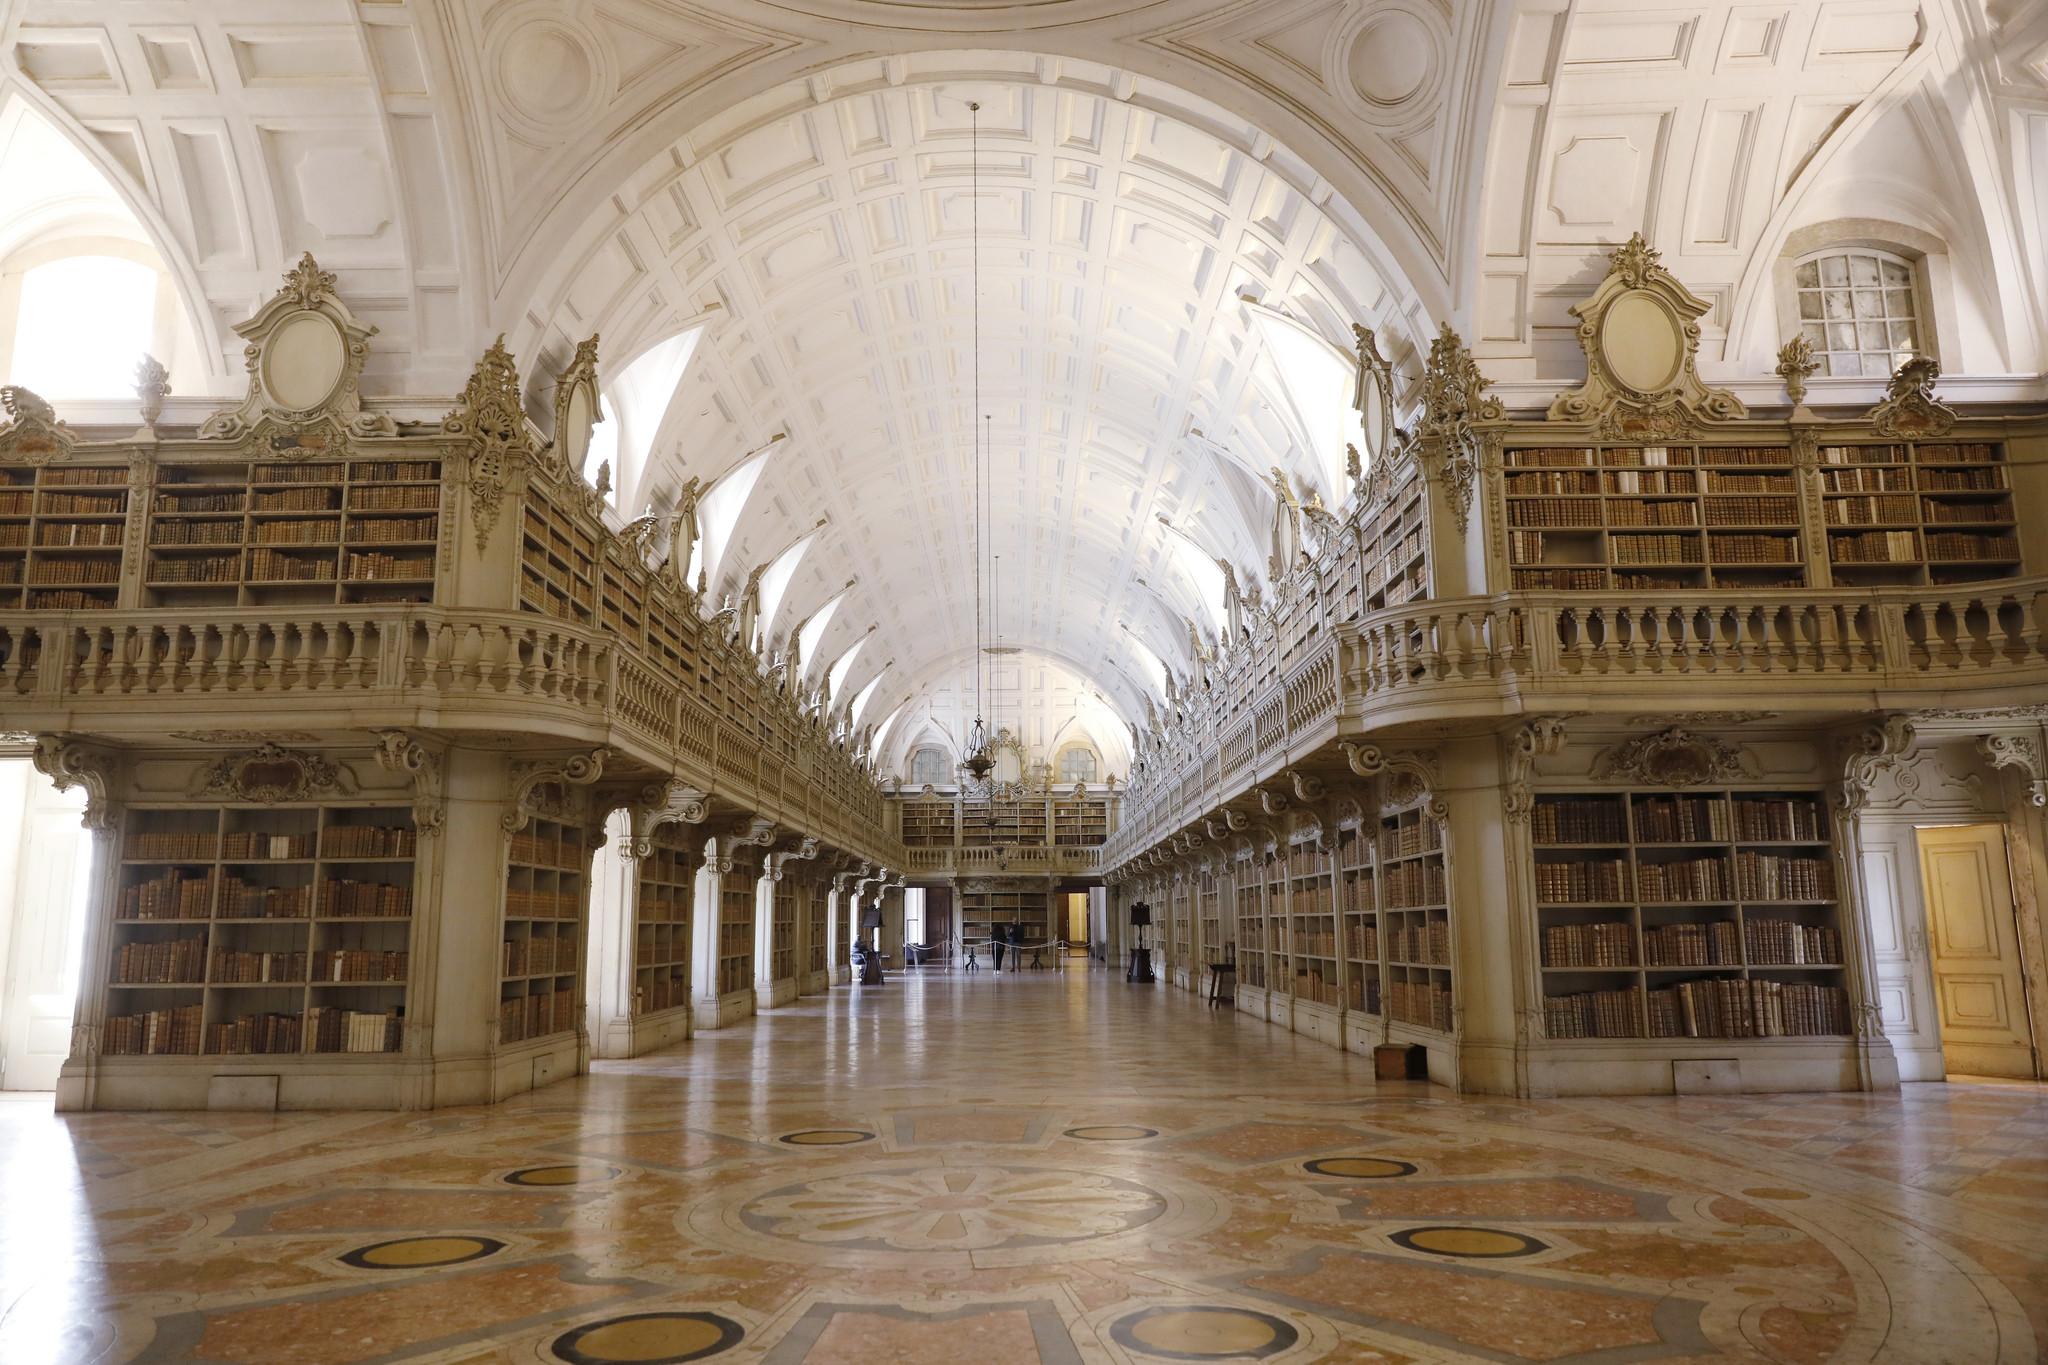 MB Biblioteca Mafra 01A.jpg